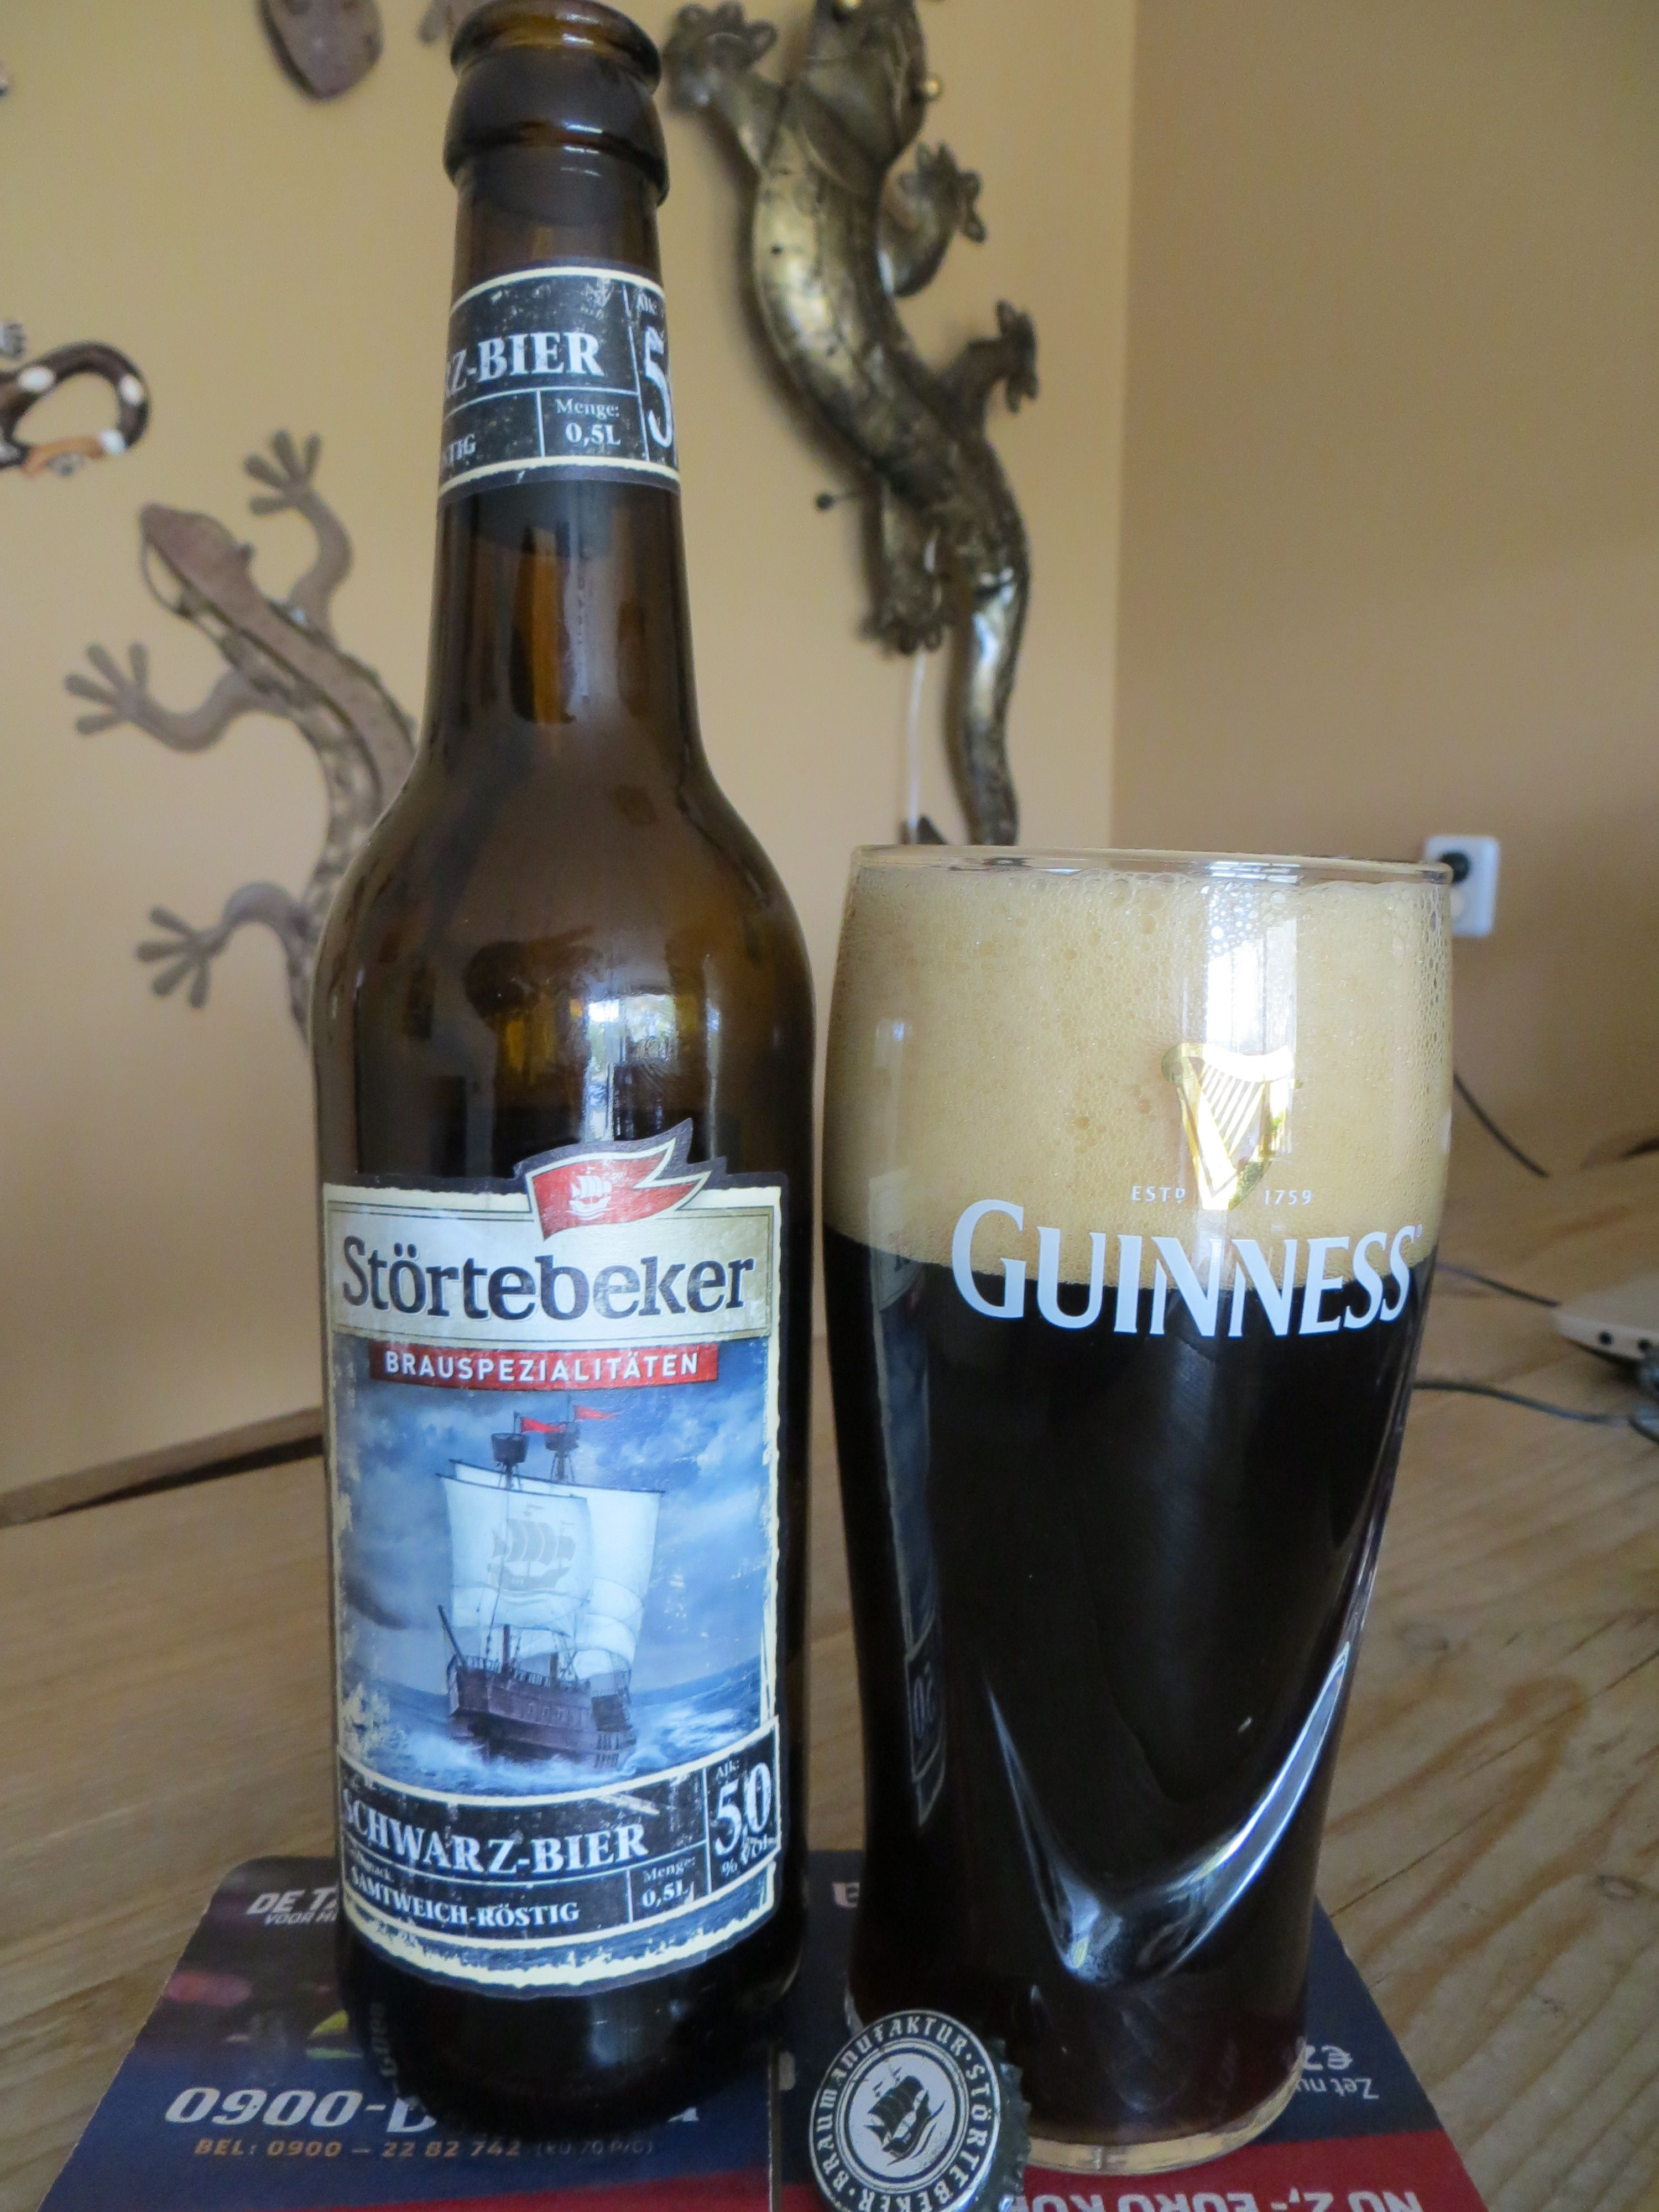 Stortebeker schwarz bier 5%